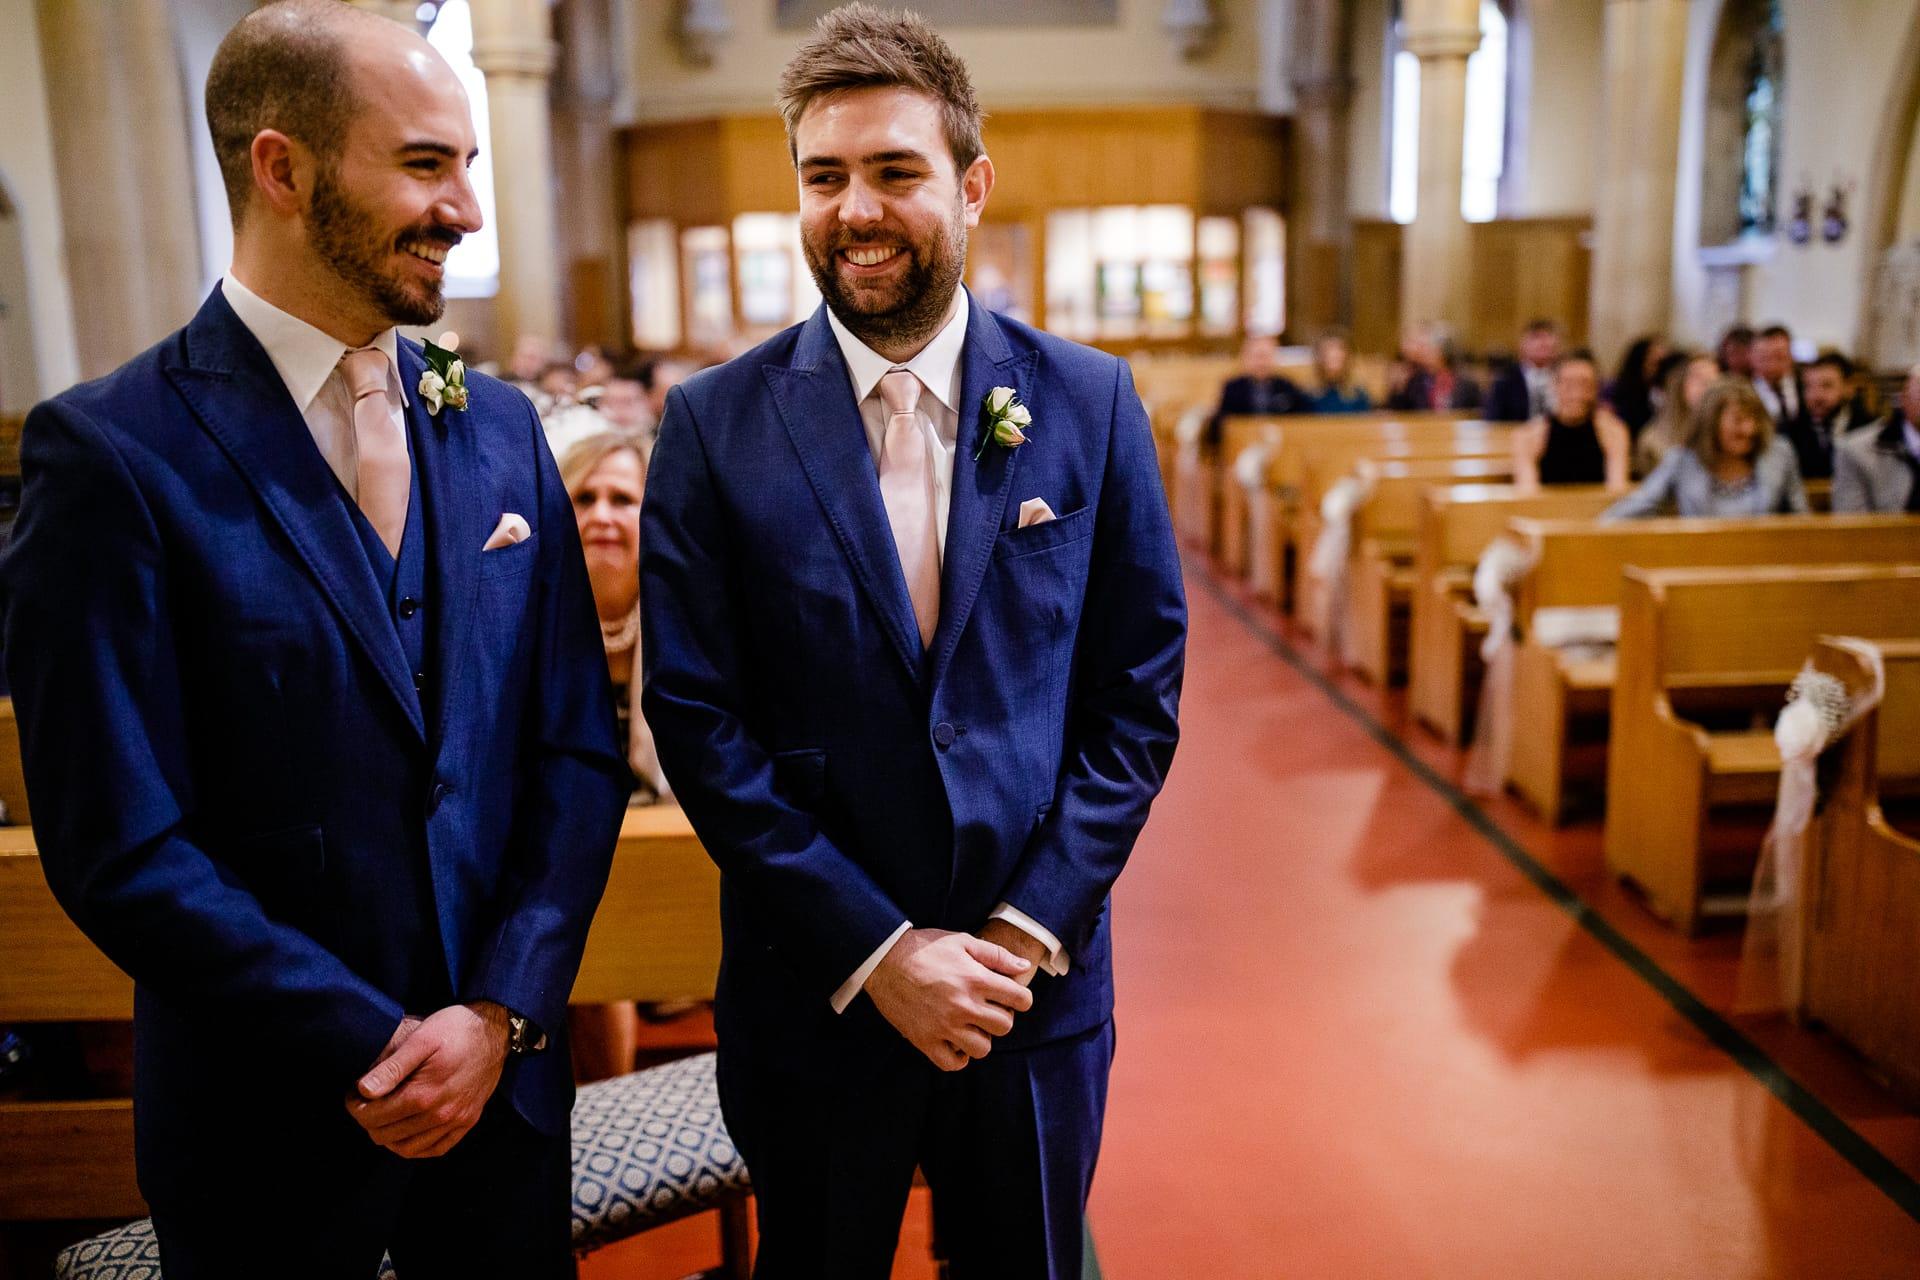 groom and best man waiting church wedding